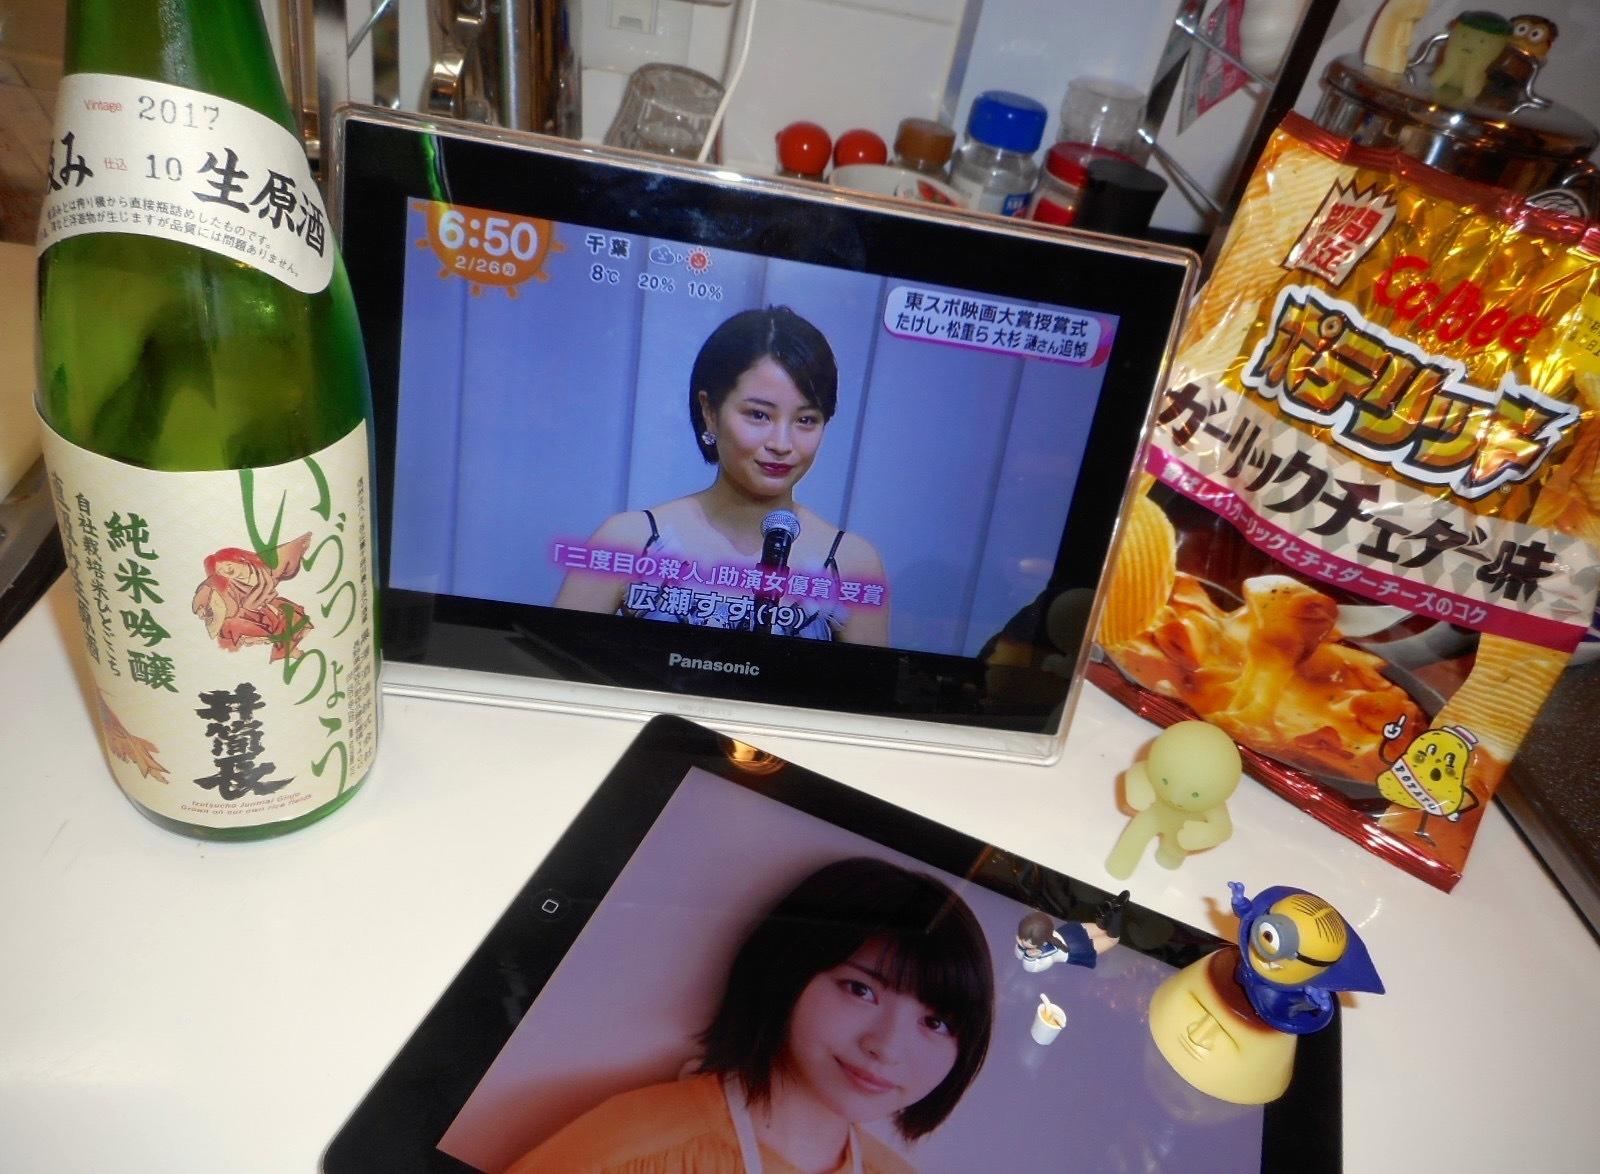 izutsuchou_jikagumi29by1.jpg